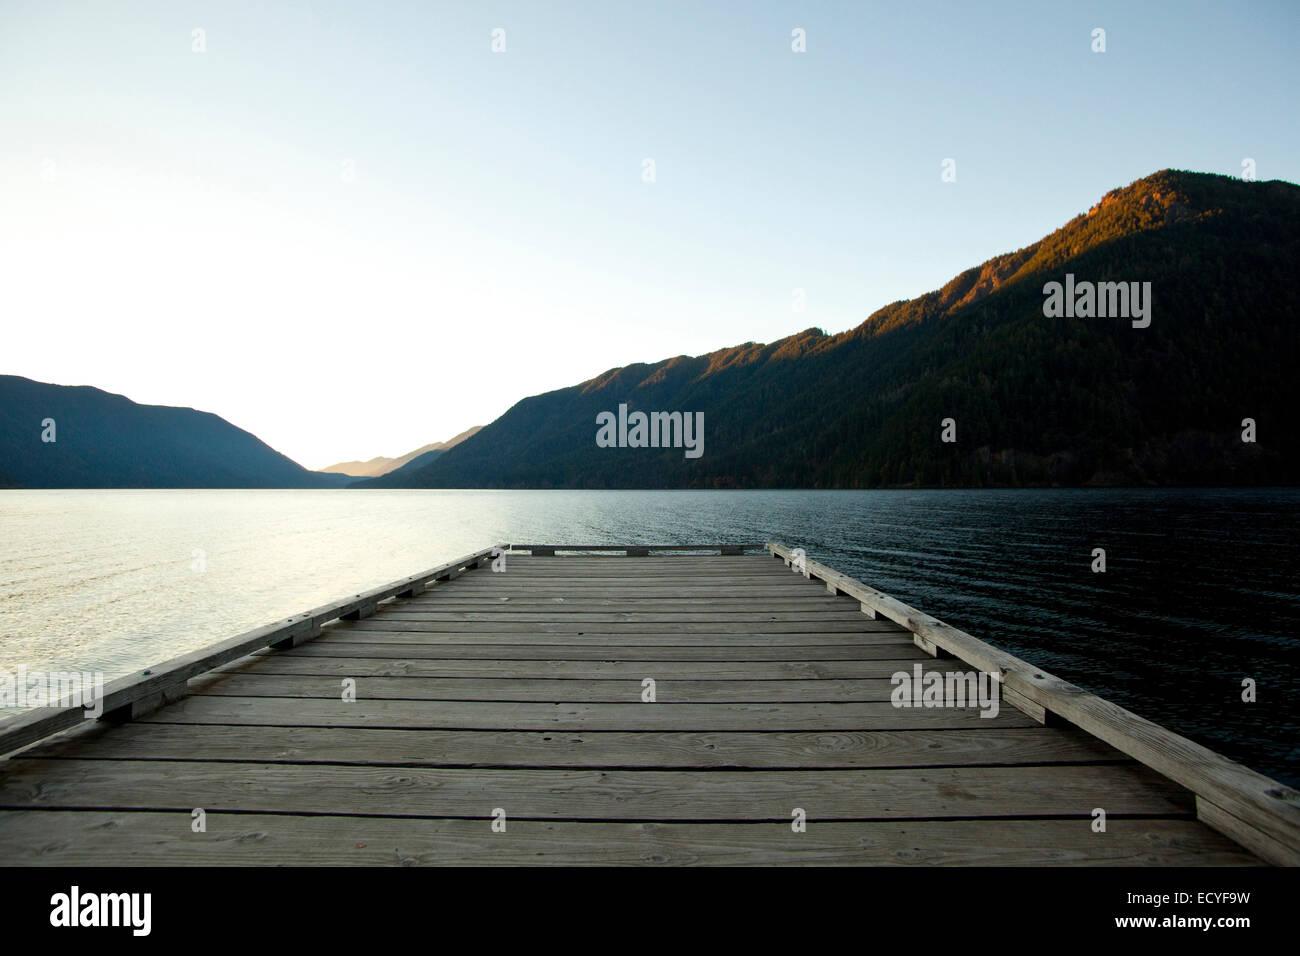 Holzdeck am See unter blauem Himmel Stockbild